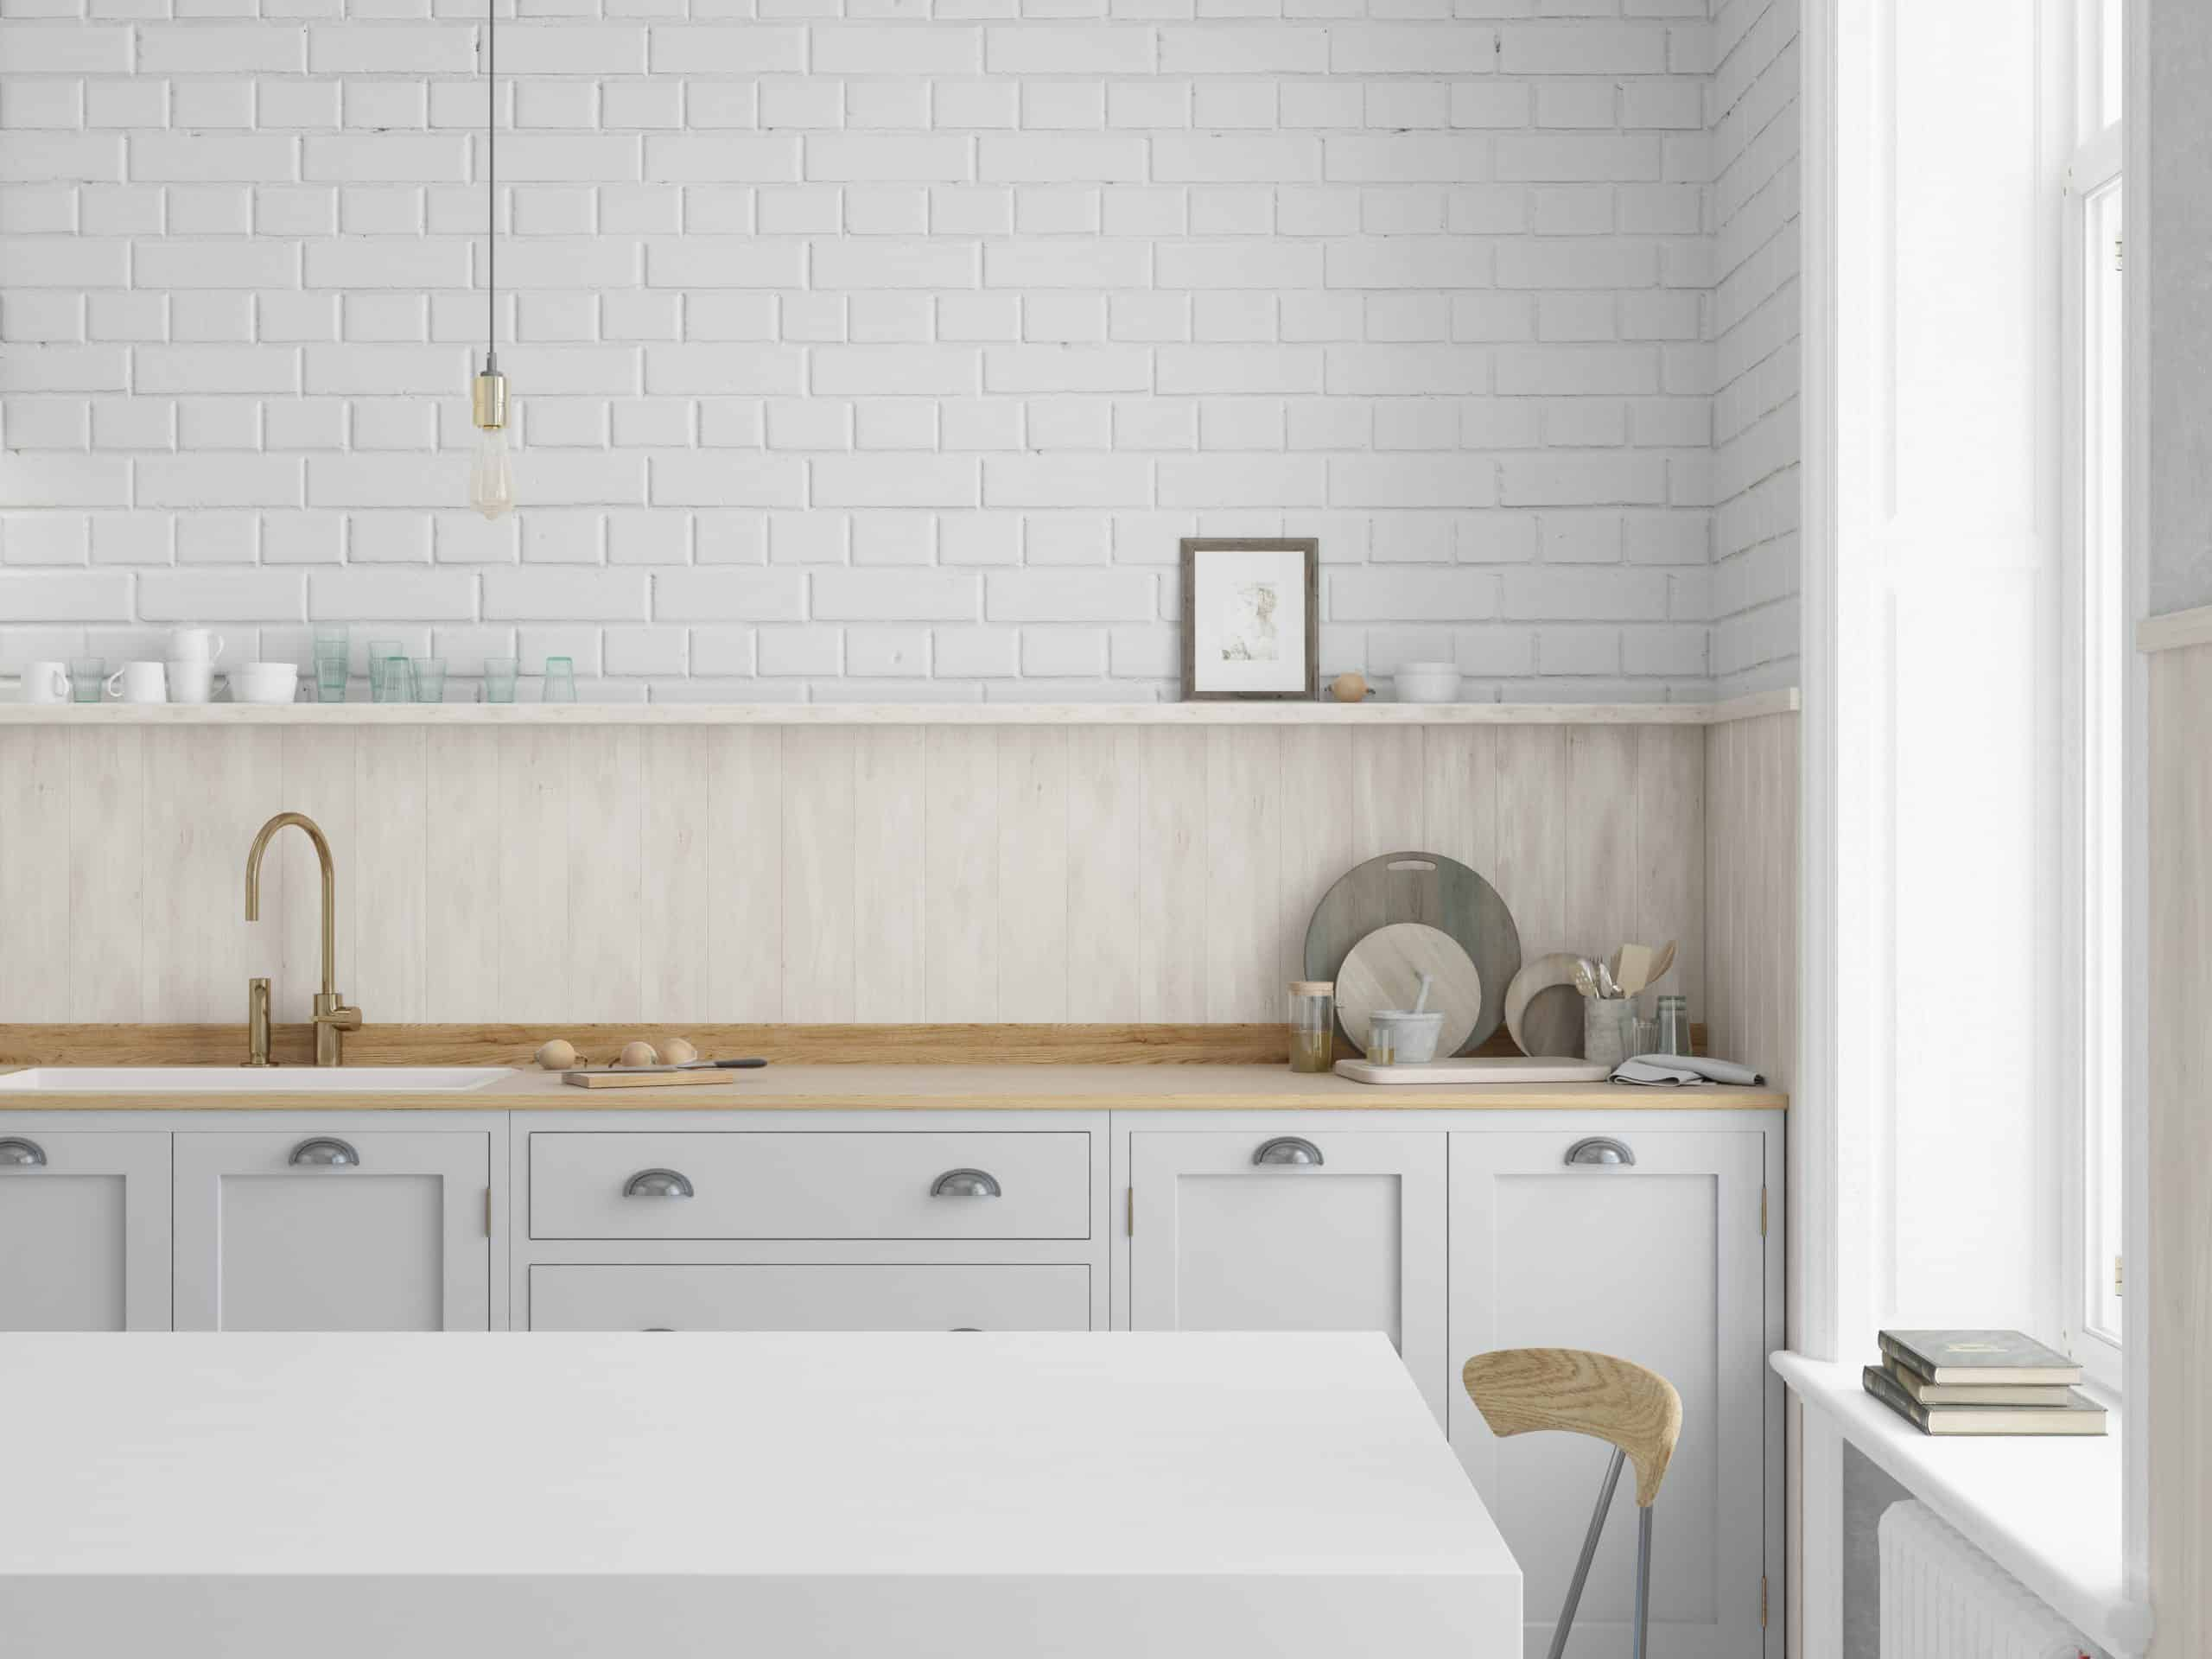 Wooden backsplah in the kitchen